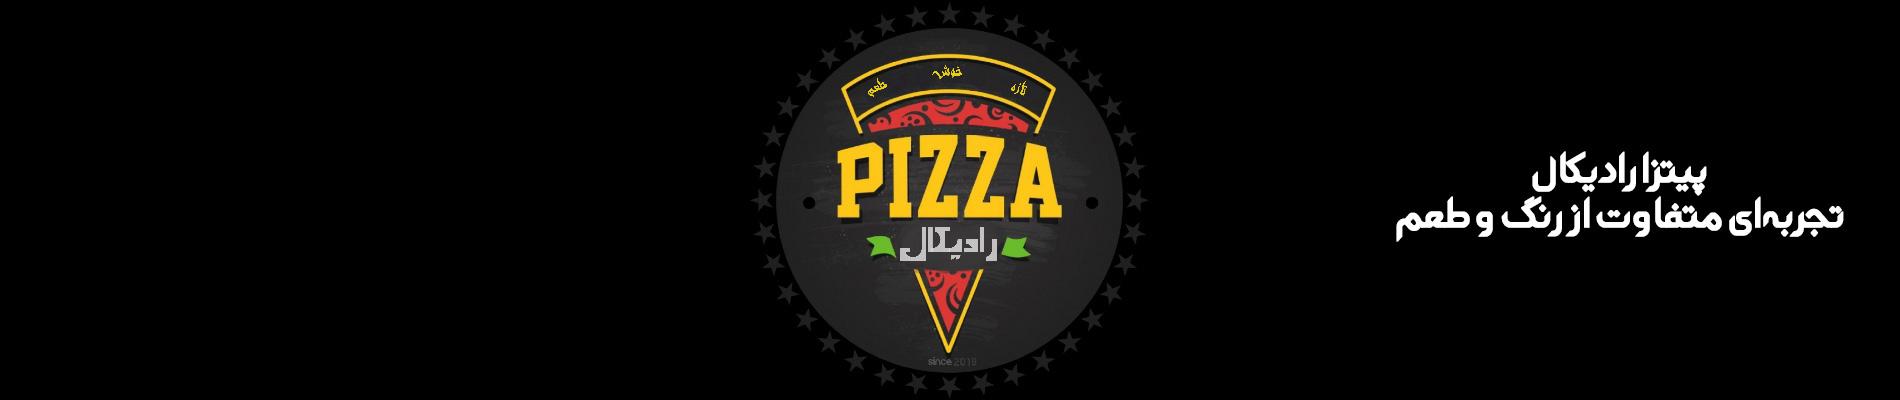 پیتزا رادیکال